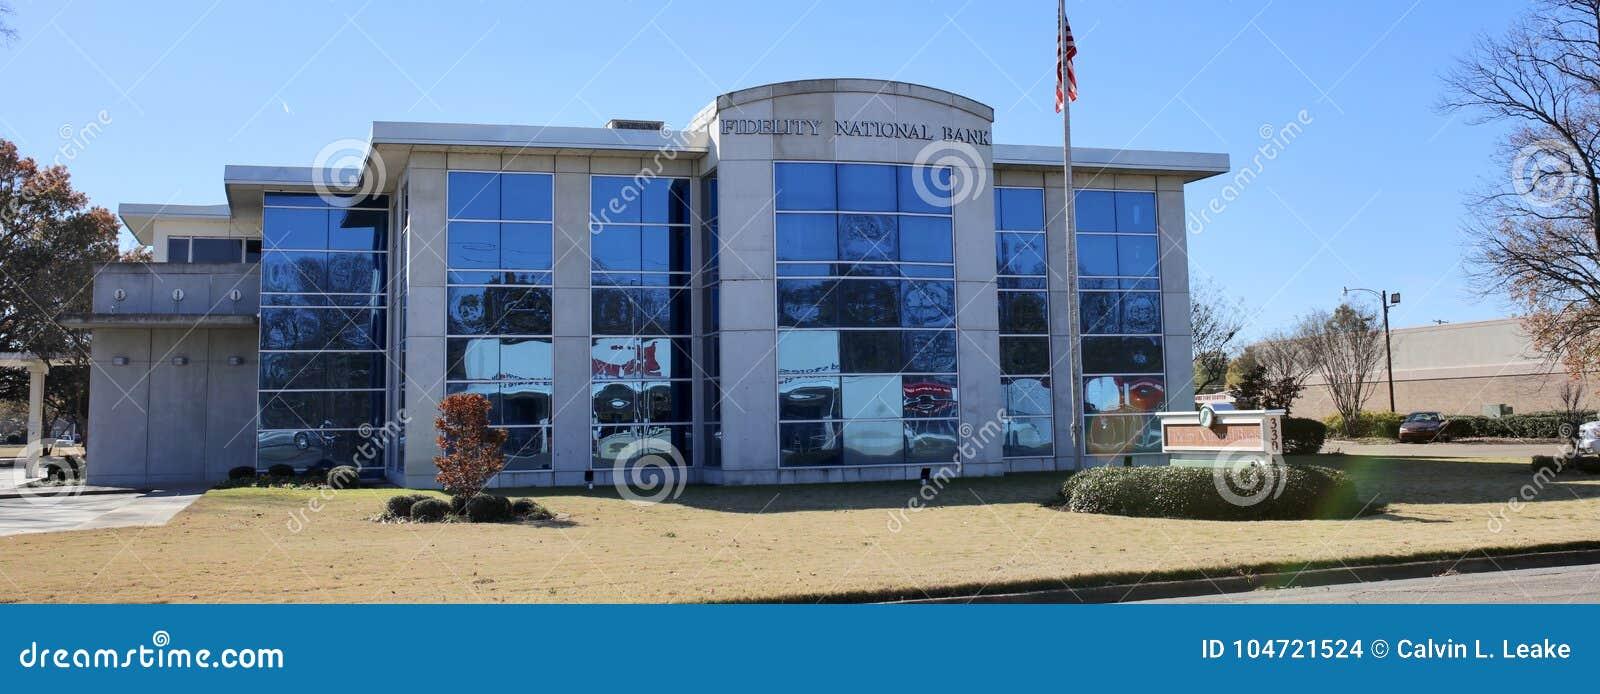 Fidelity Bank Auto Loan >> Fidelity National Bank West Memphis Arkansas Editorial